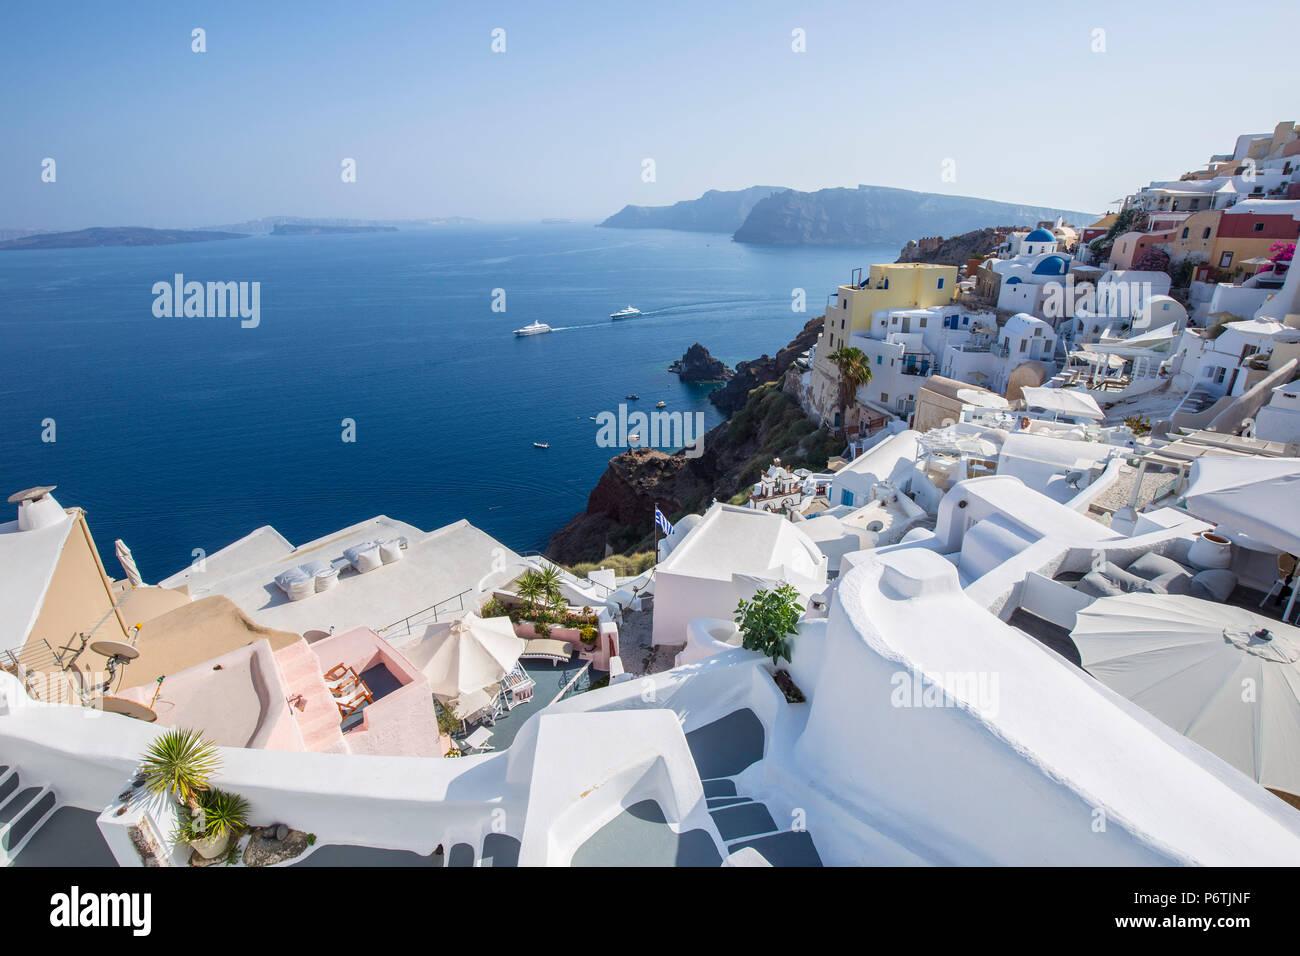 Oia, Santorini (Thira), Islas Cícladas, Grecia Imagen De Stock